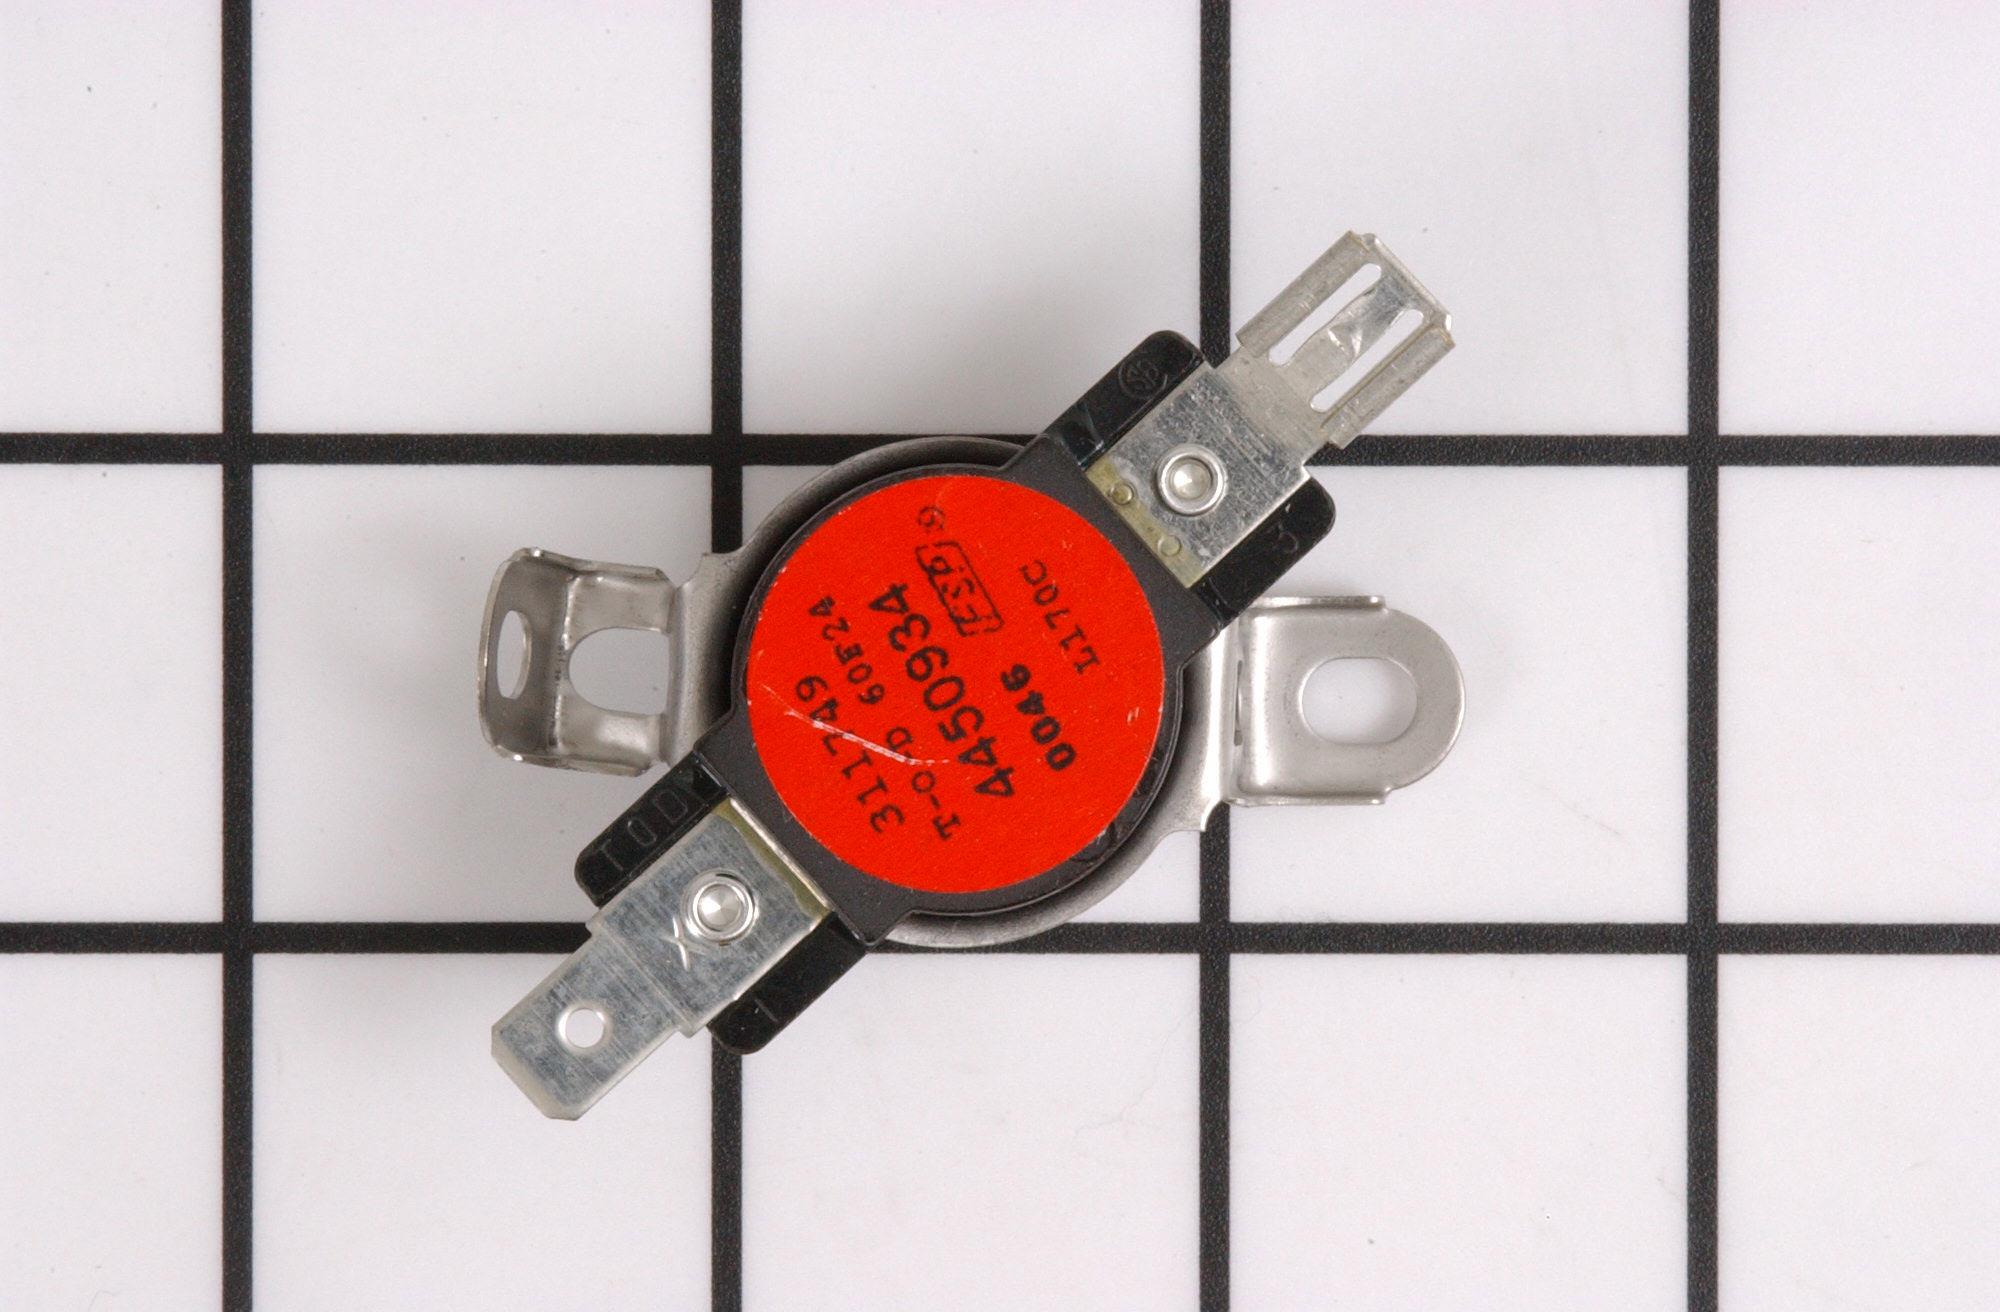 KitchenAid Range/Stove/Oven Part # WP4450934 - Thermal Fuse